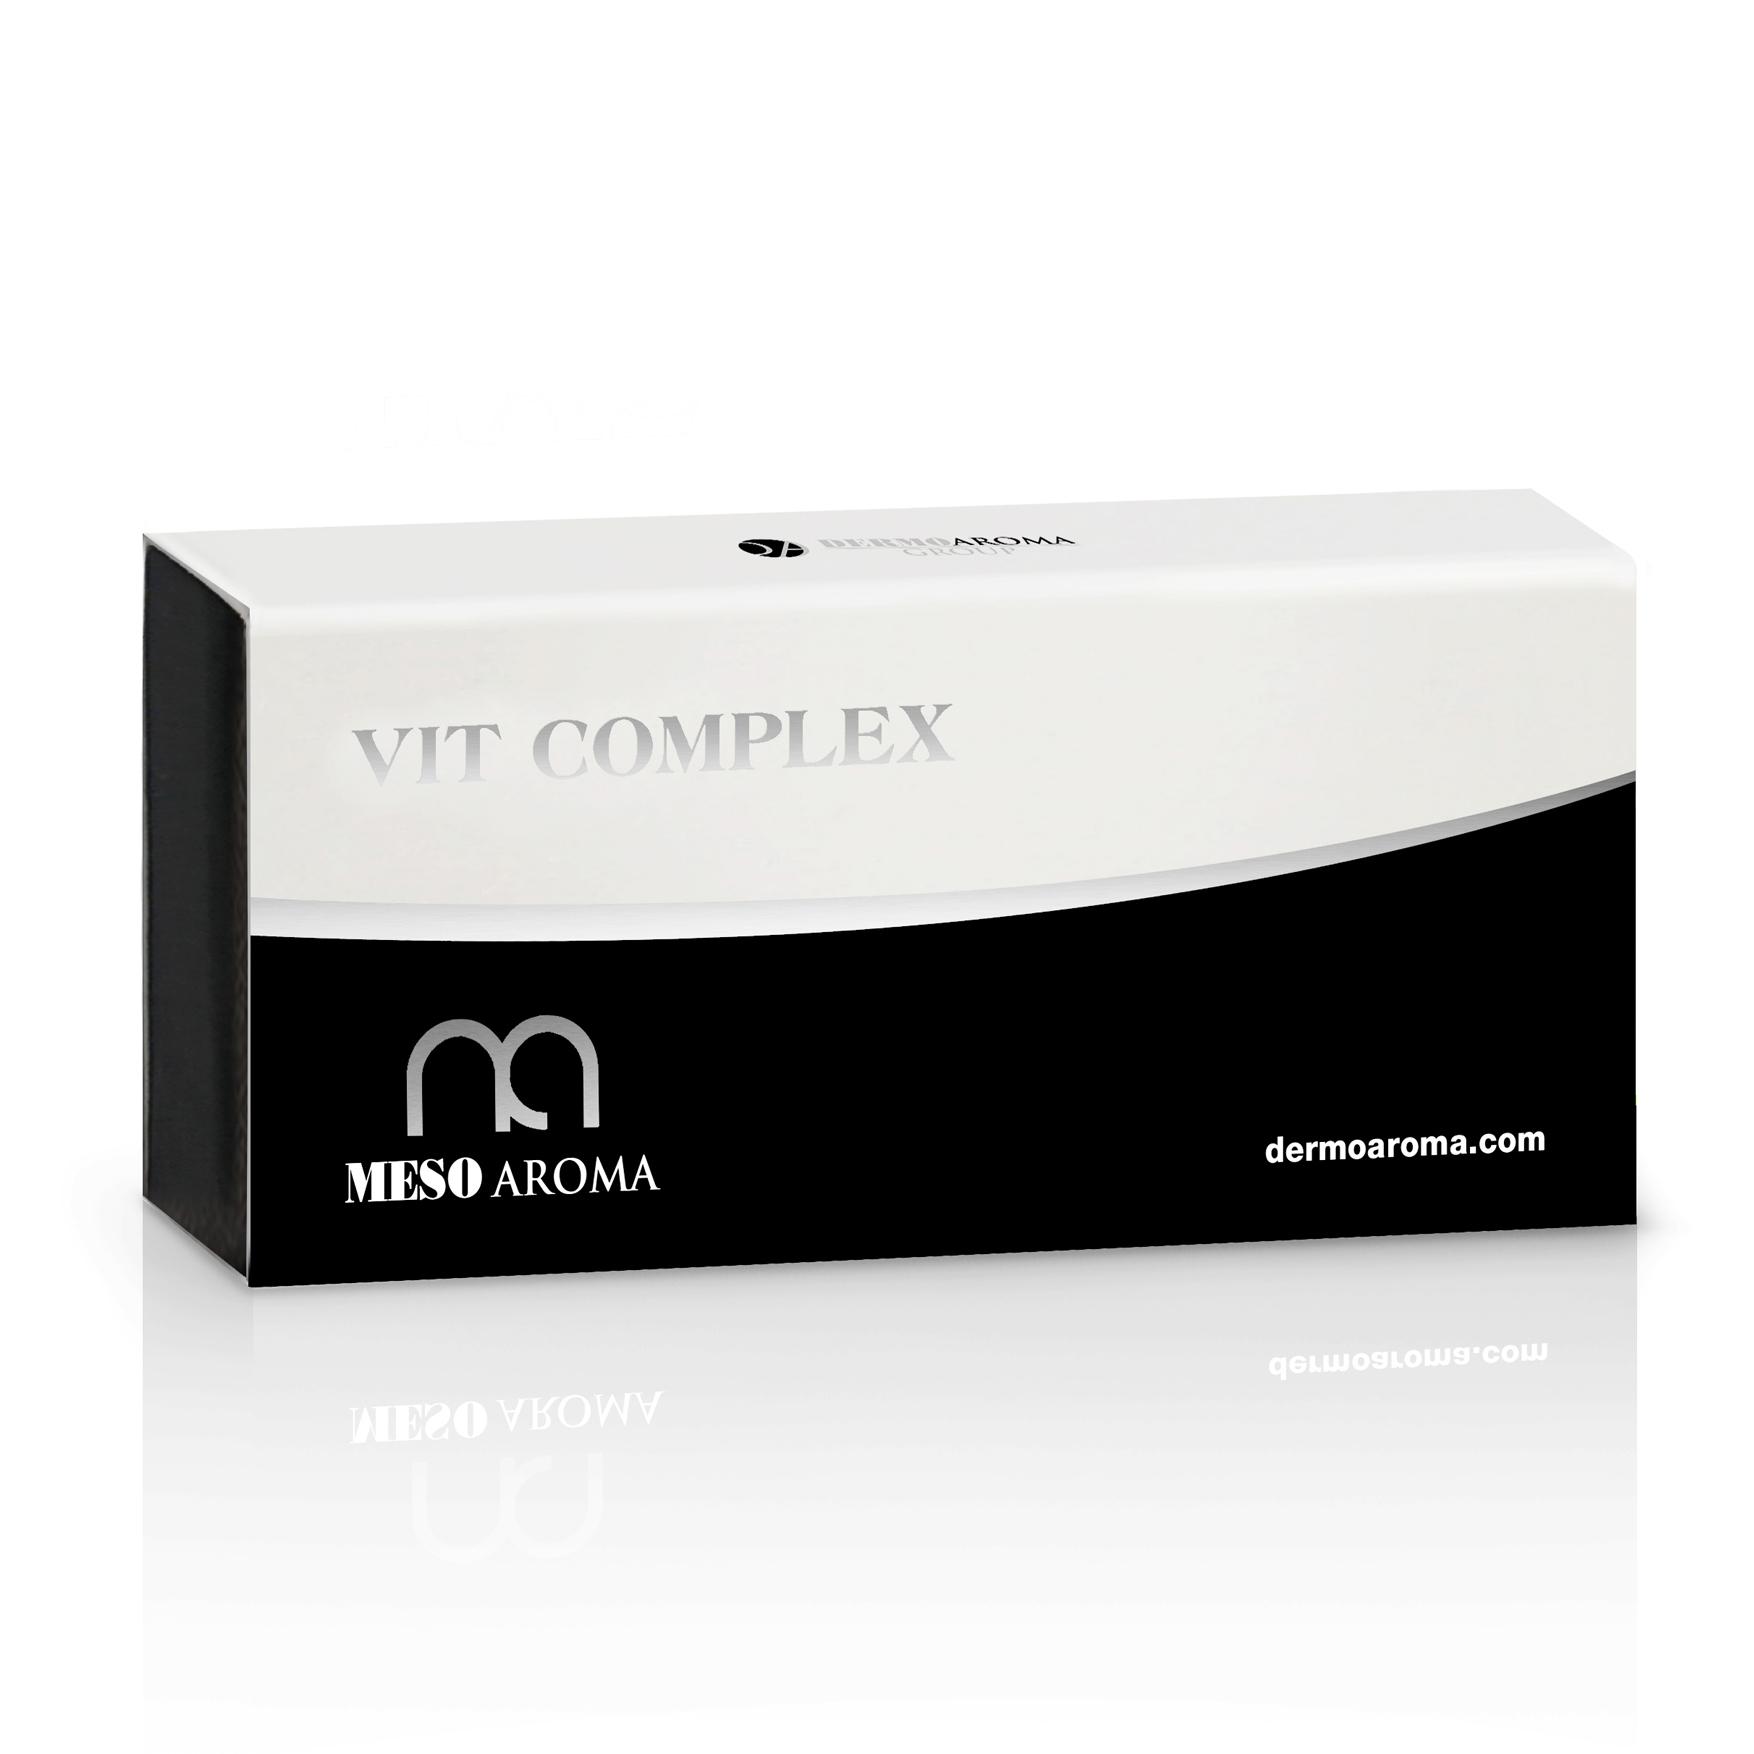 Mesoaroma-ampułki-do-mezoterapii-VIT-COMPLEX